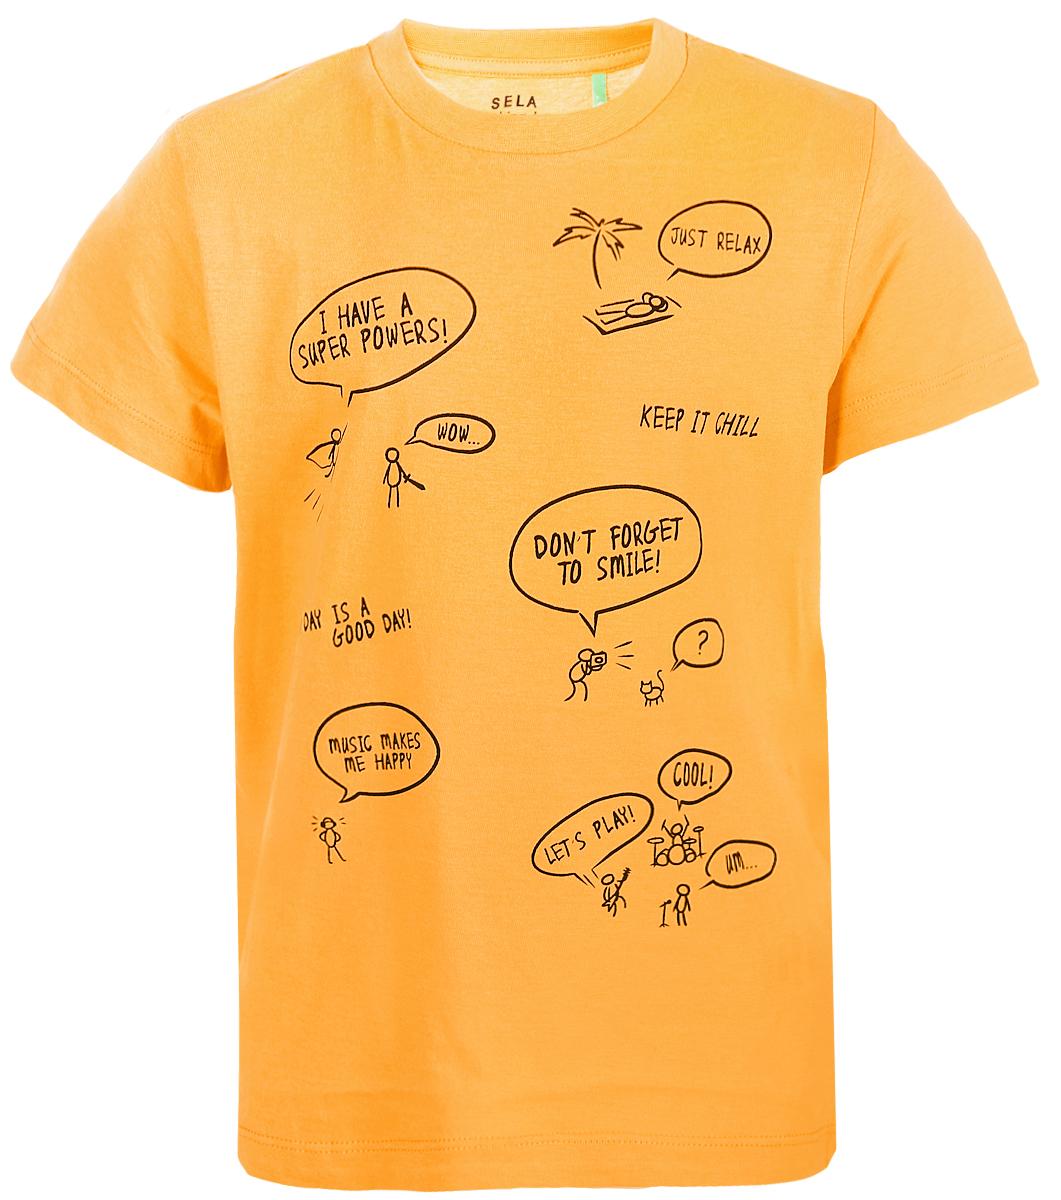 Футболка для мальчика Sela, цвет: желтый. Ts-711/584-8112. Размер 110 цена